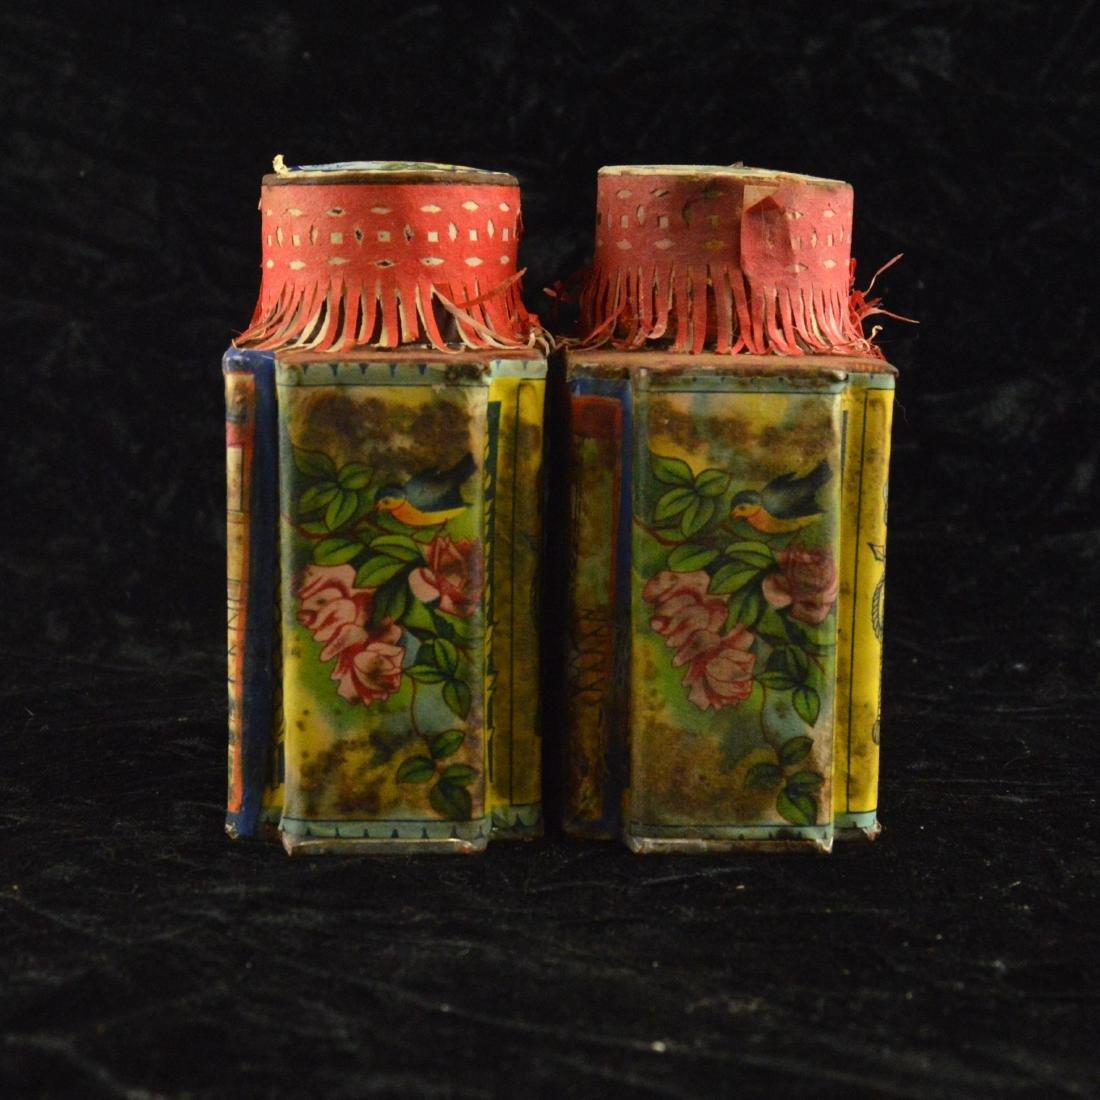 Chinese Republic Tea Tin Pair - 2